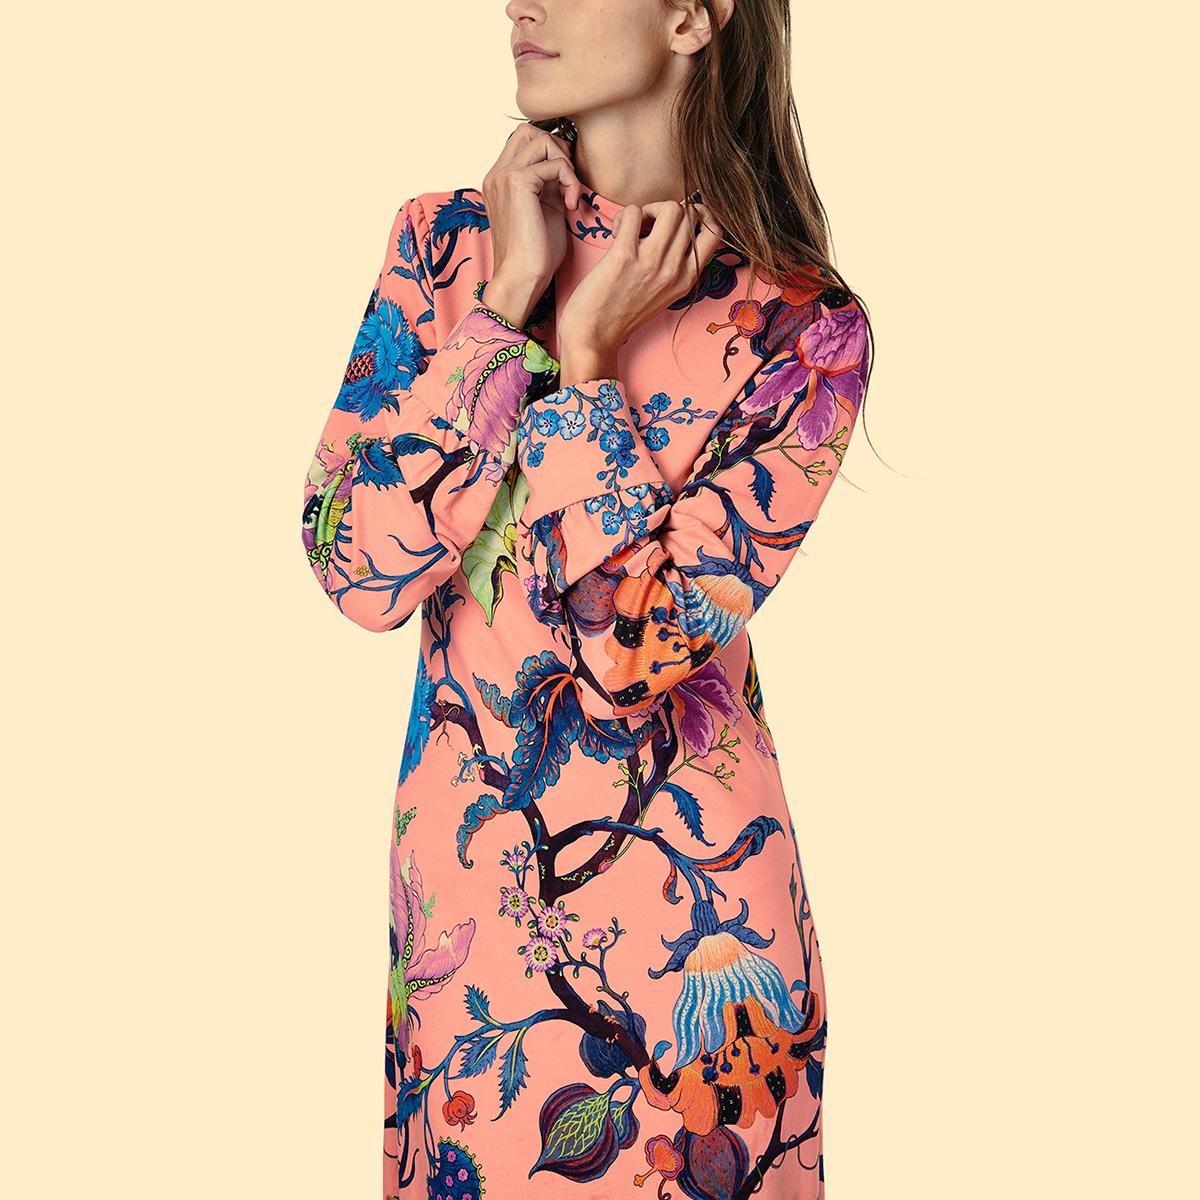 Ossie Dress - Artemis by House of Hackney